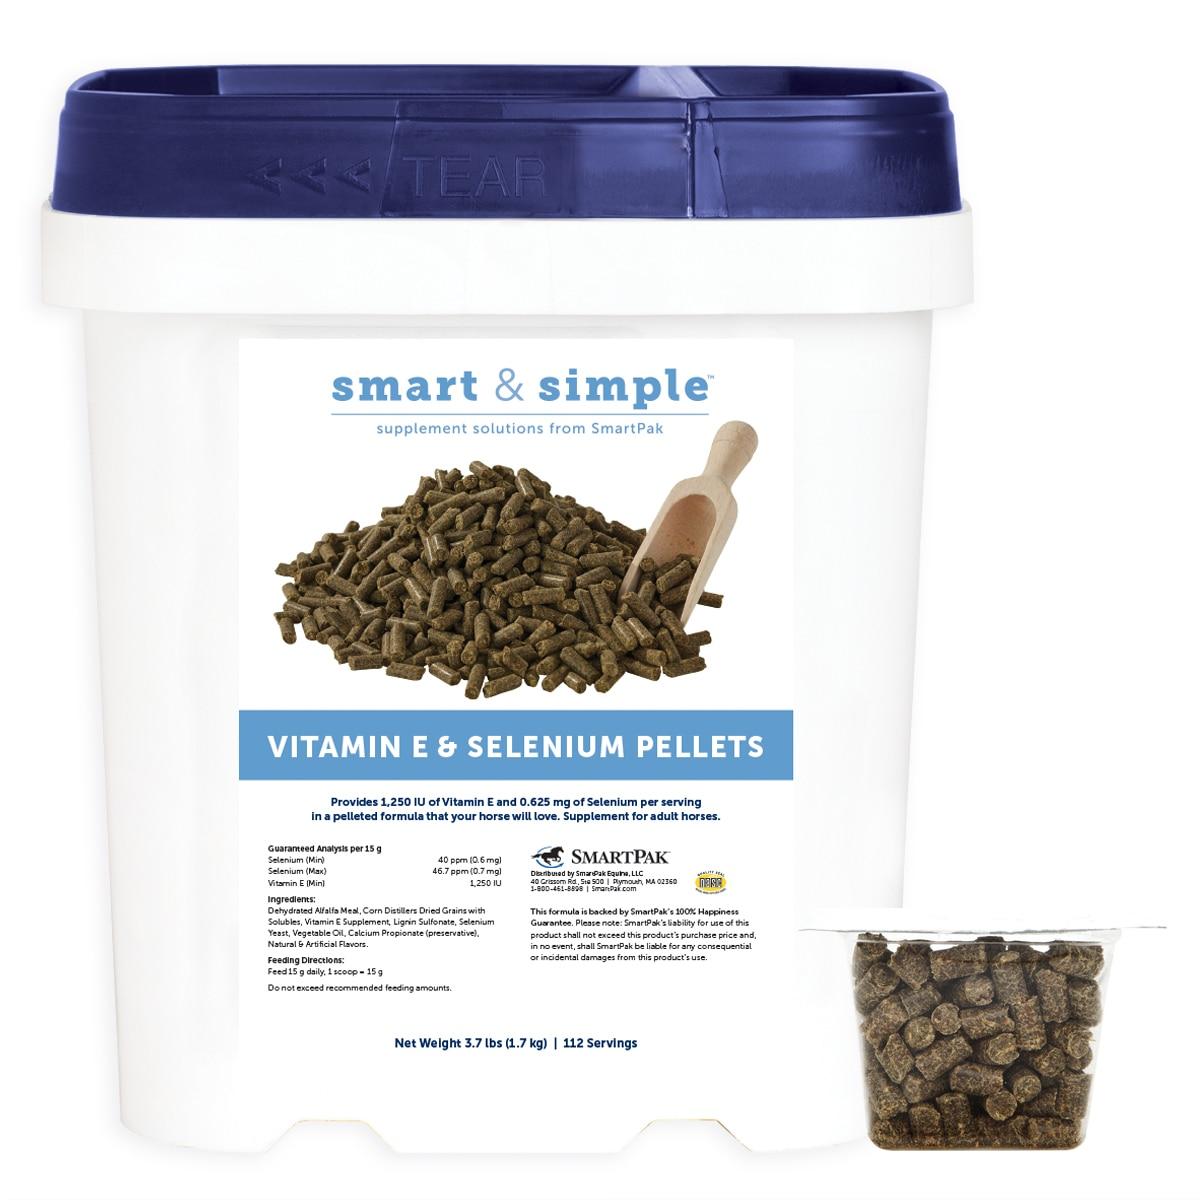 Smart & Simple™ Vitamin E & Selenium Pellets (formerly Vitamin E & Selenium Pellets by SmartPak)